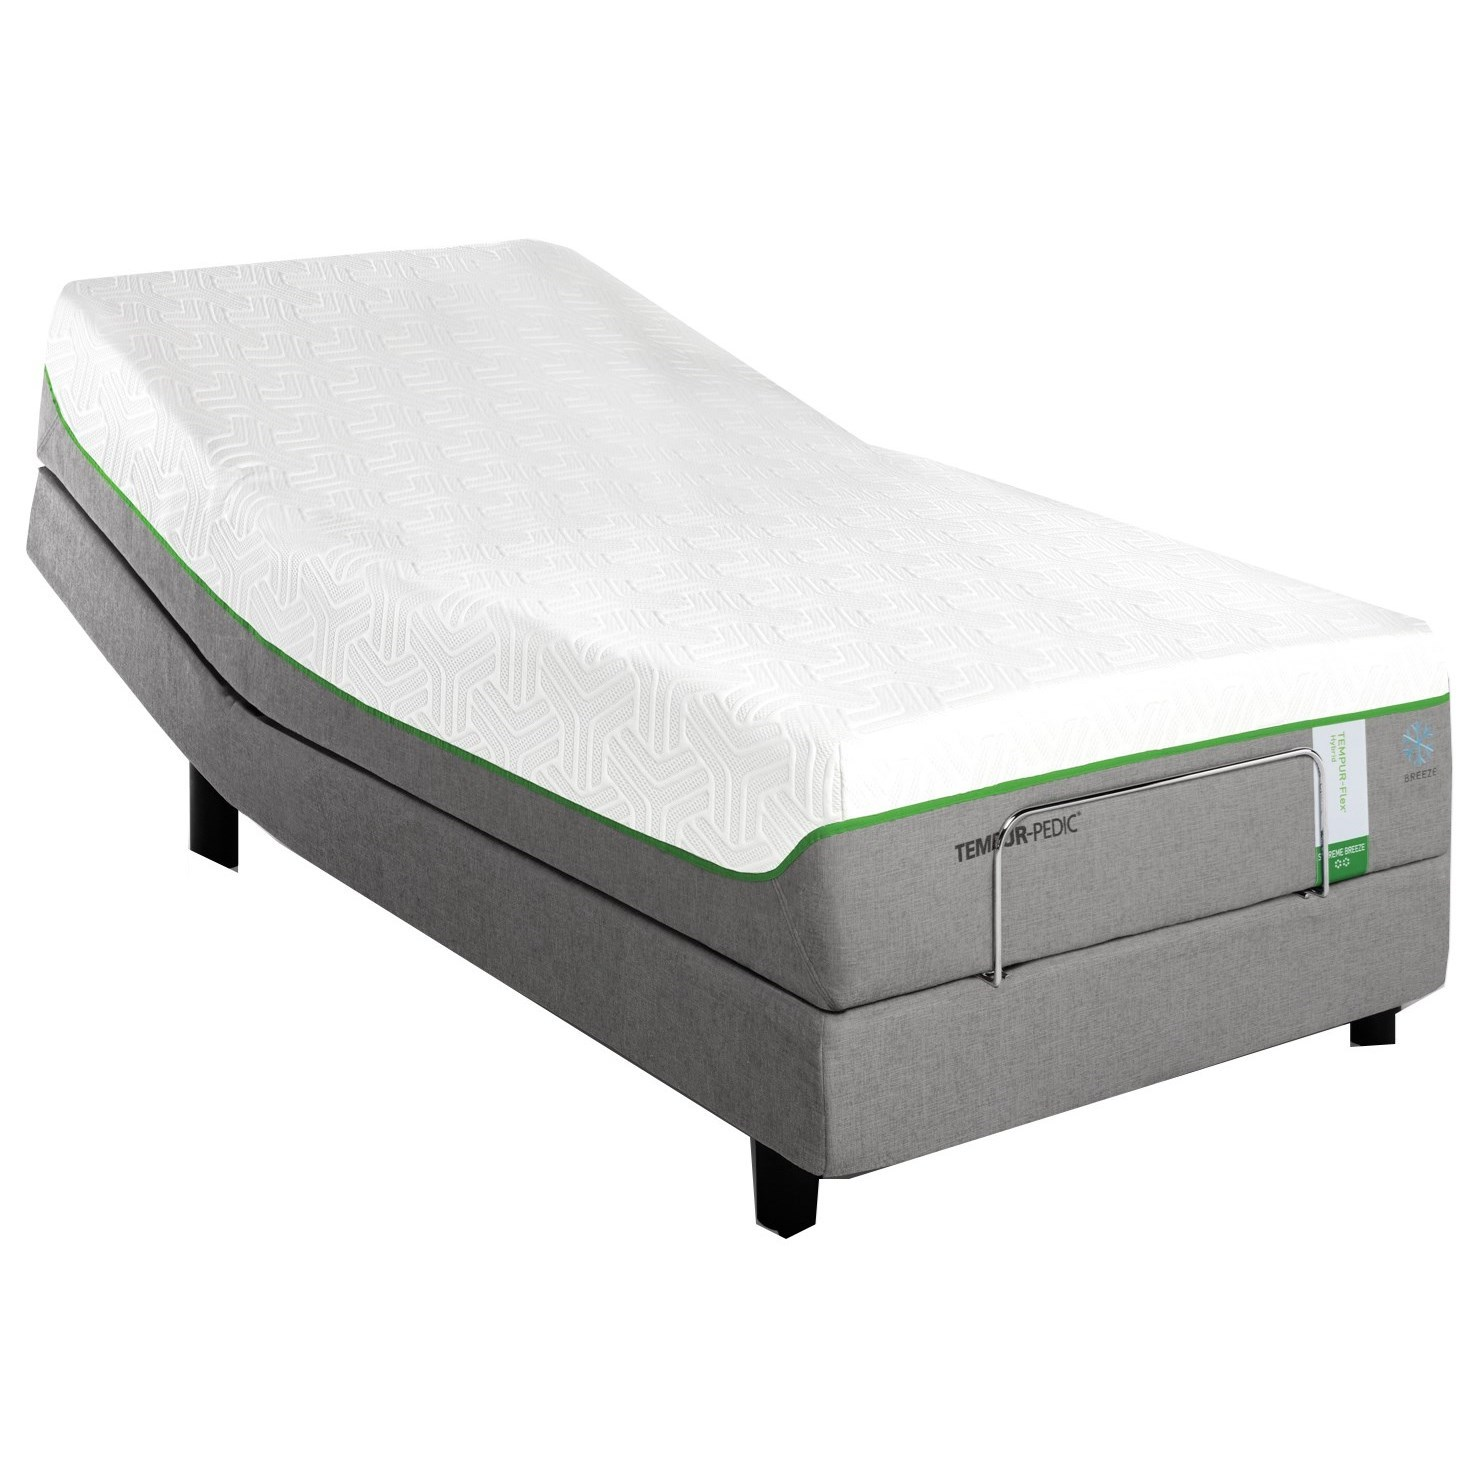 Tempur-Pedic® TEMPUR-Flex Supreme Breeze Twin Extra Long Medium Plush Adj Set - Item Number: 10292220+25558120